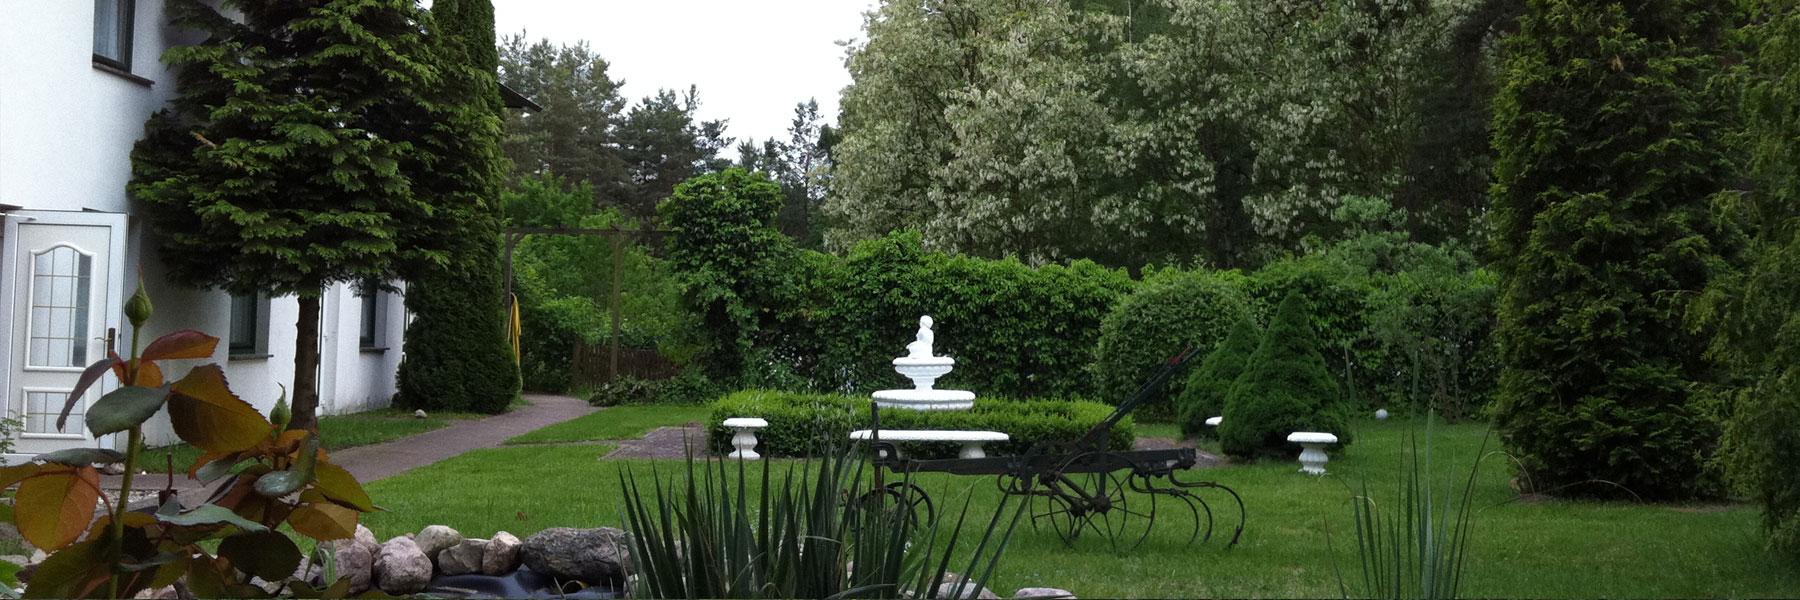 Garten - Hotel & Waldrestaurant Johannesruh